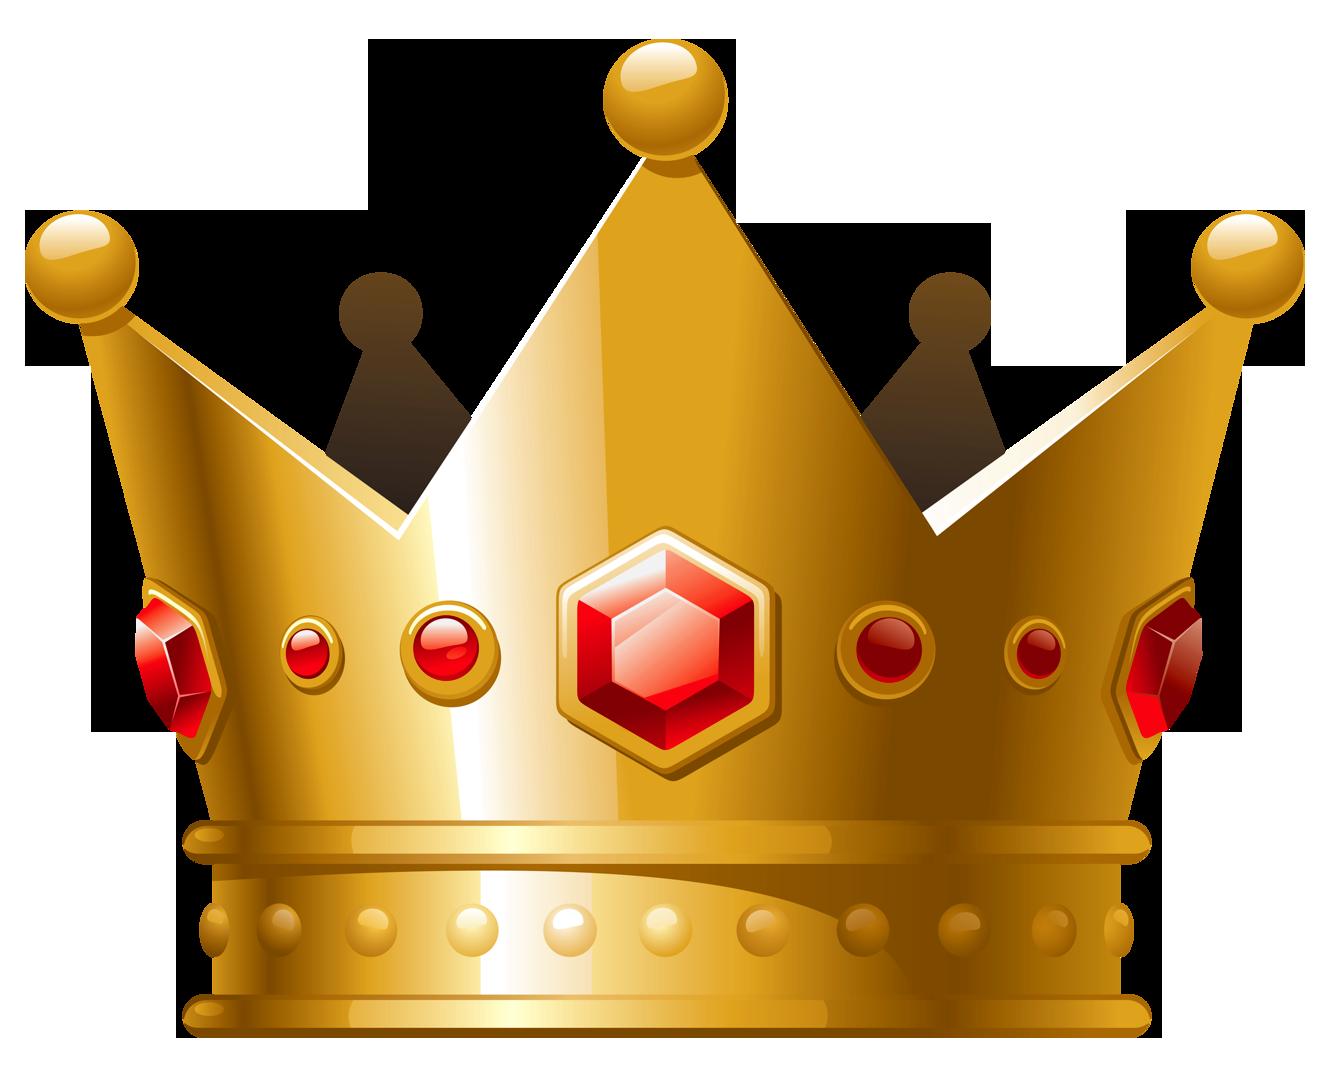 Golden Crown PNG Image.